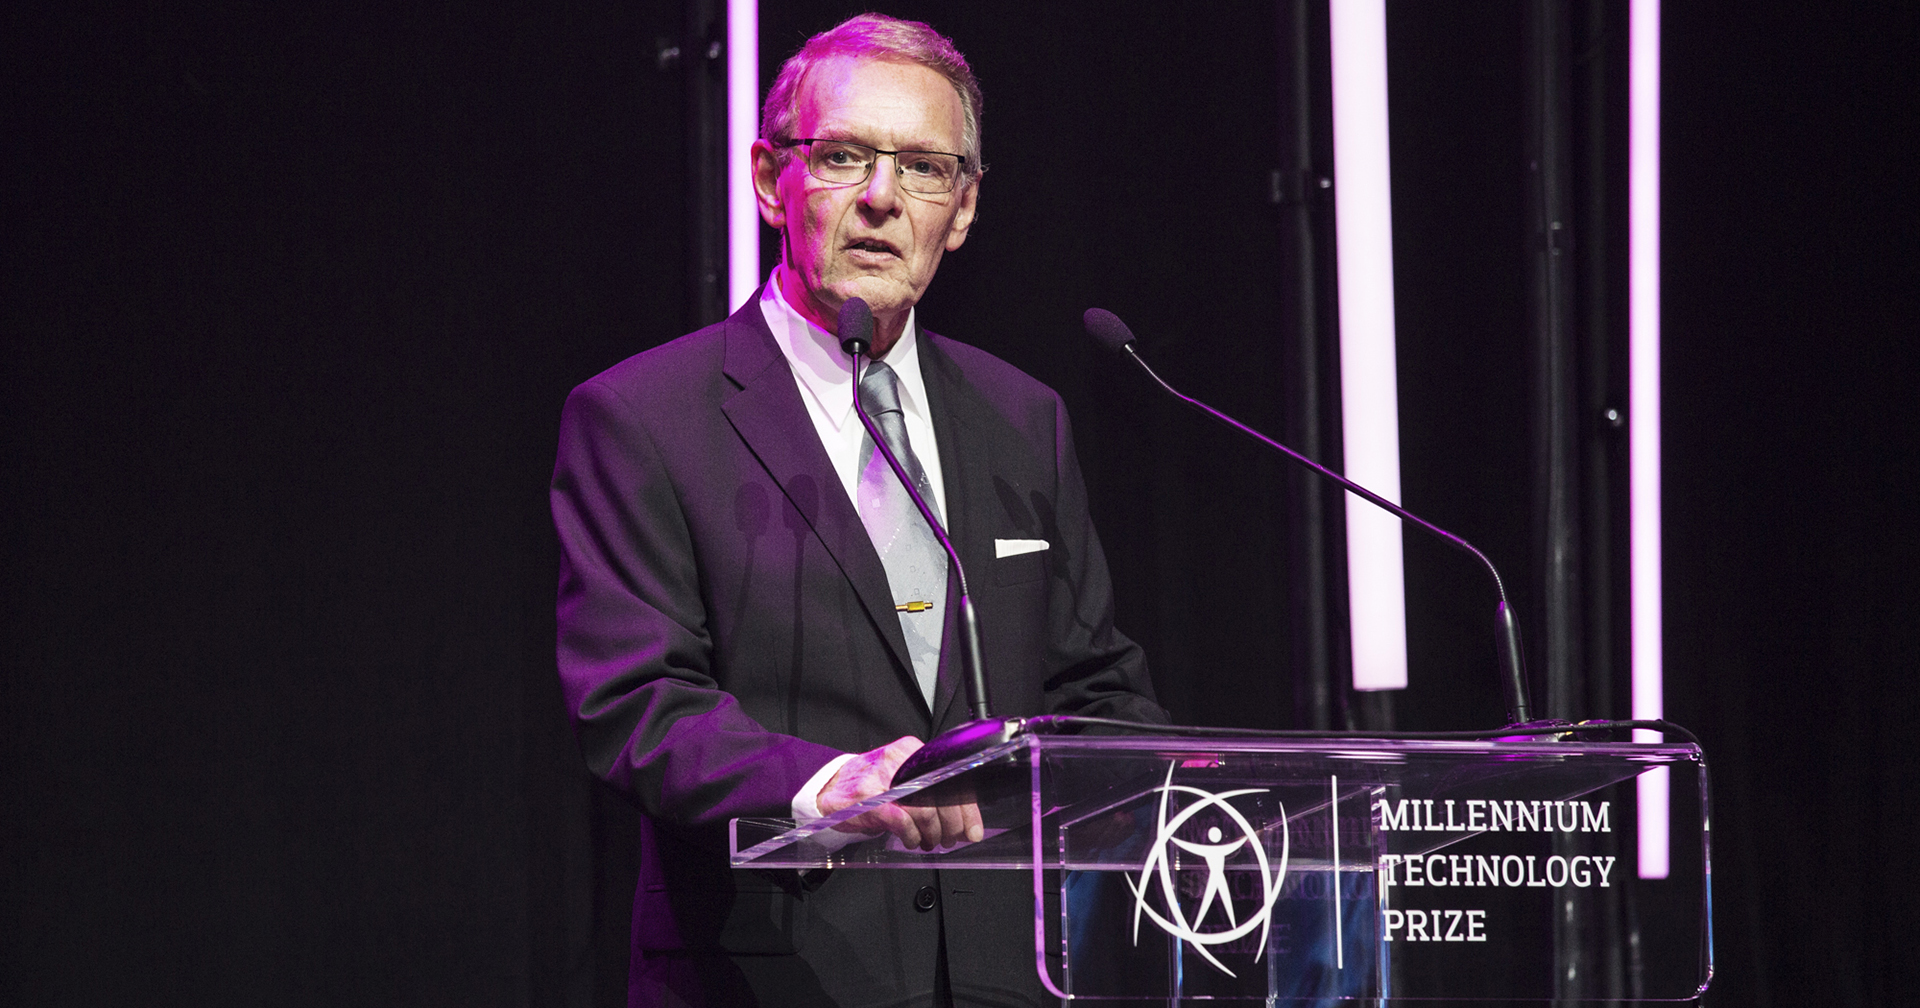 Tuomo Suntola wins Millennium Technology Prize 2018